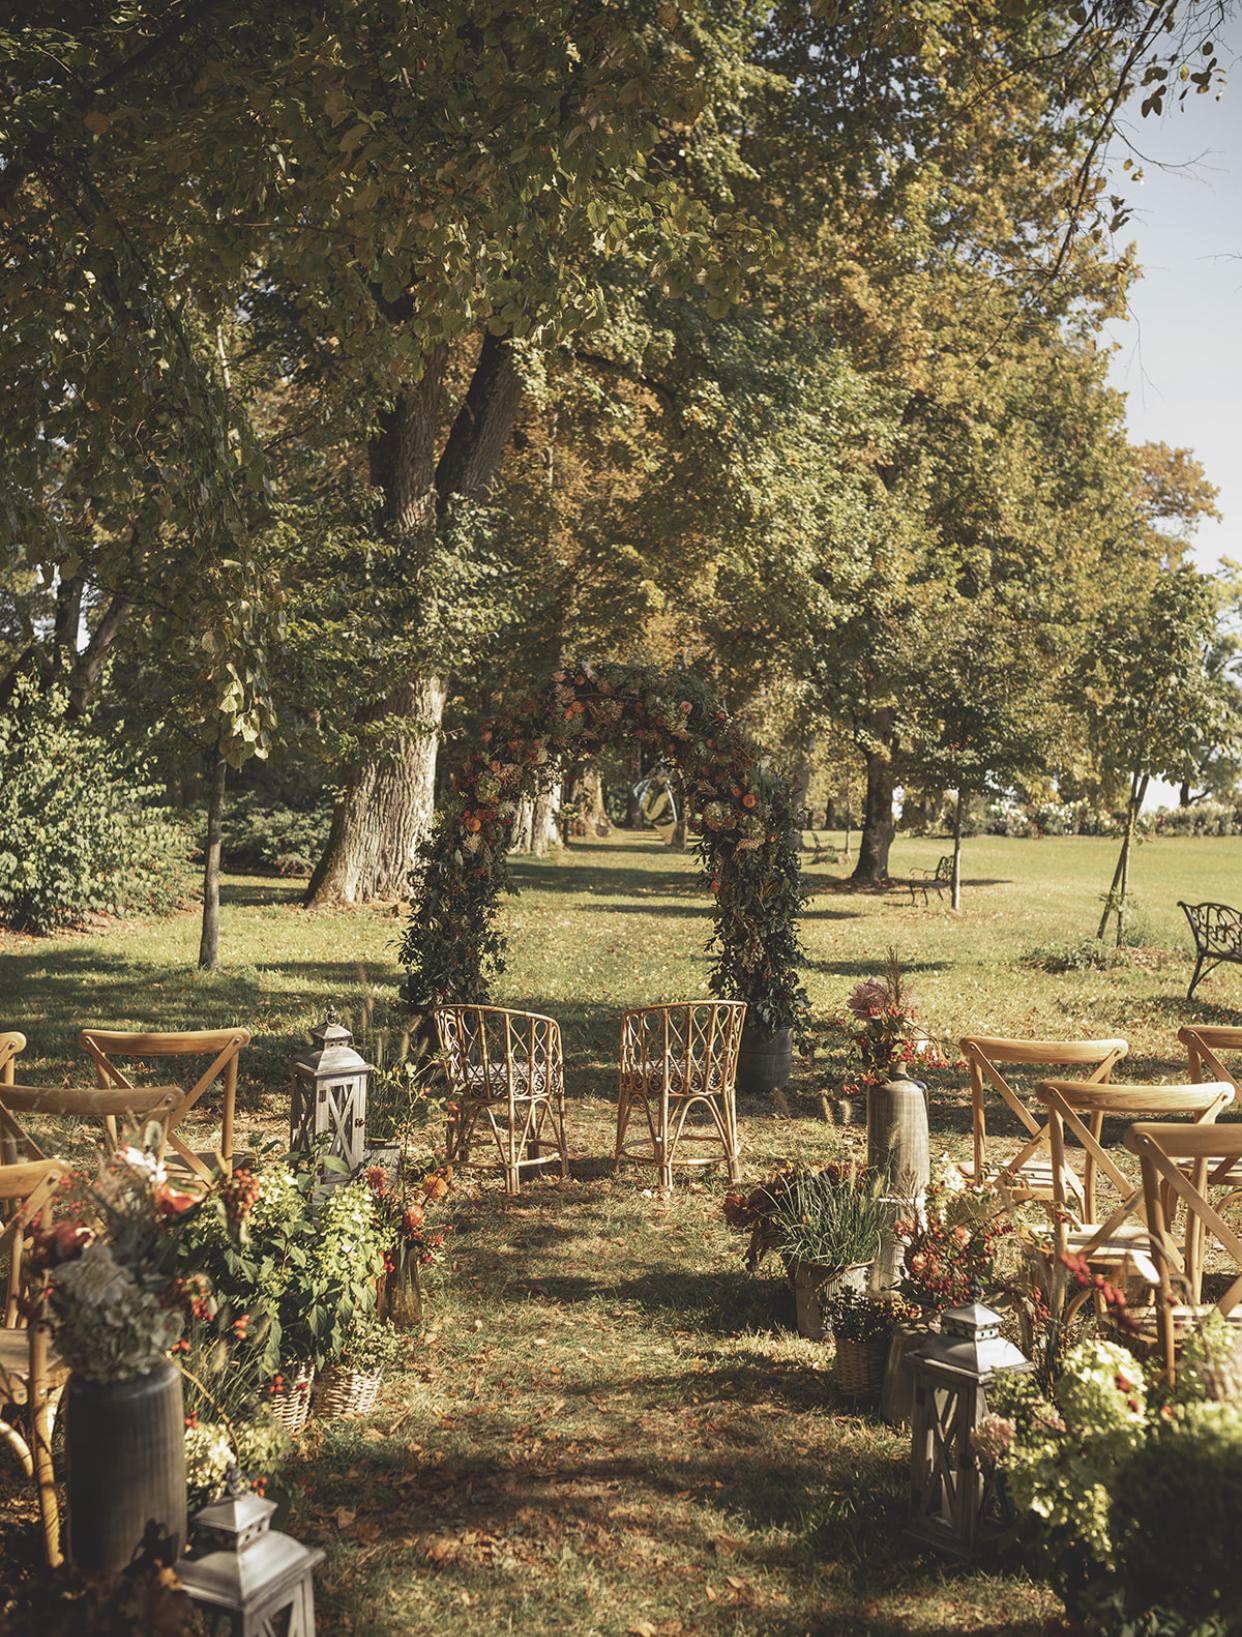 IMG 2816 - Quelle cérémonie choisir pour son mariage?